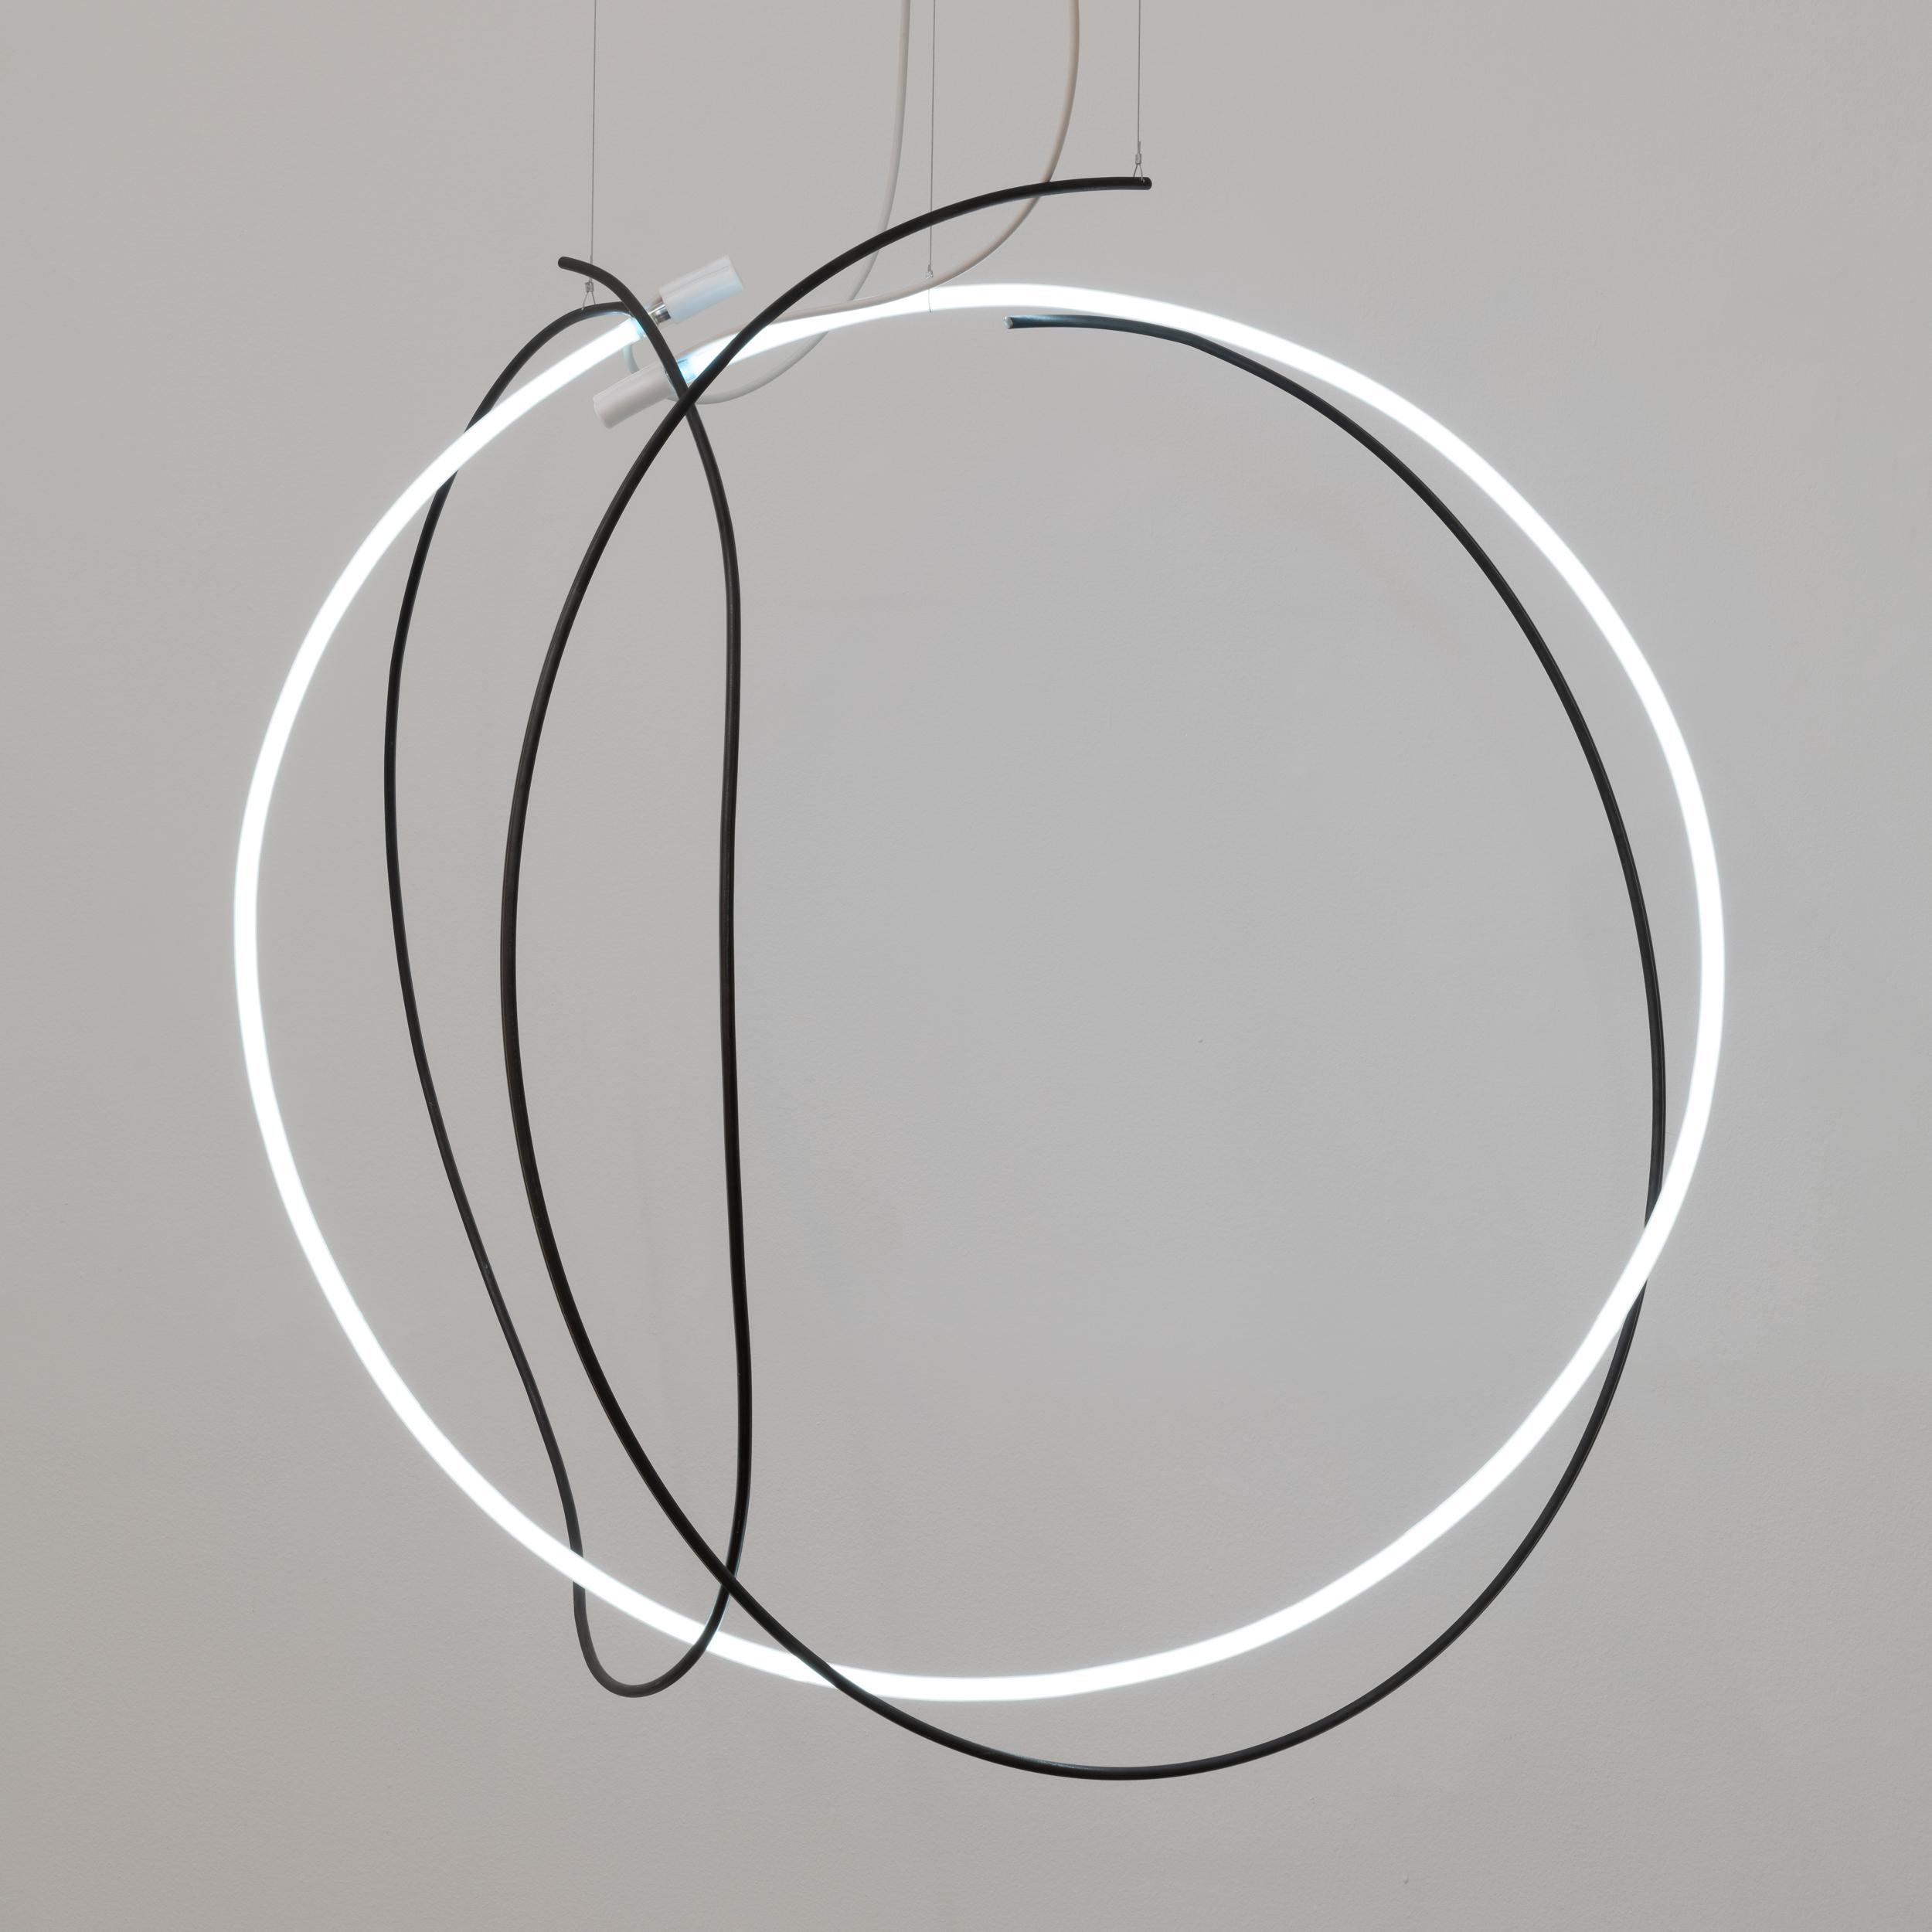 CIRCULUS, 2018 95 x 95 x 110 cm Steel, neon